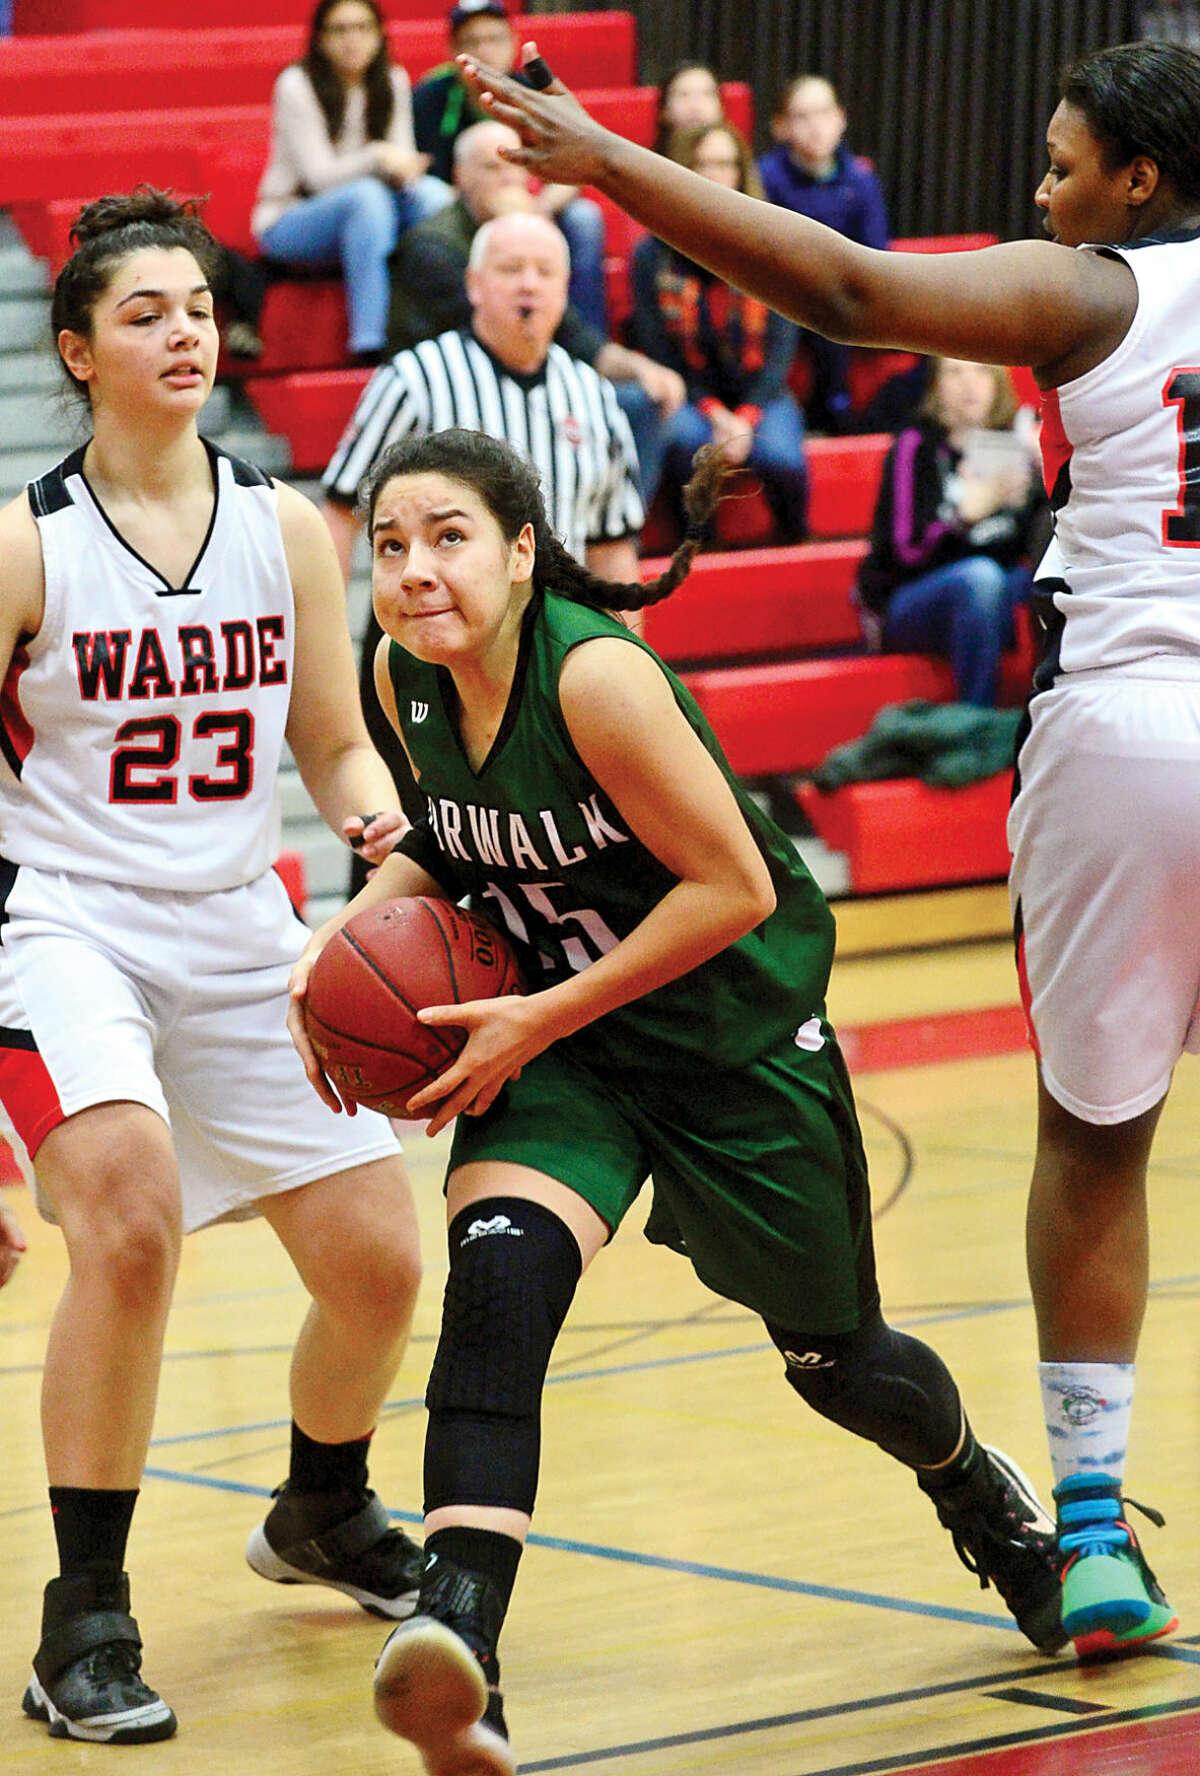 Hour photo / Erik Trautmann Norwalk High School Girls Basketball player #15 Tatiana Arias goes up for the shot against Fairifeld Warde in the FCIAC quarter finals Saturday in Fairfield.